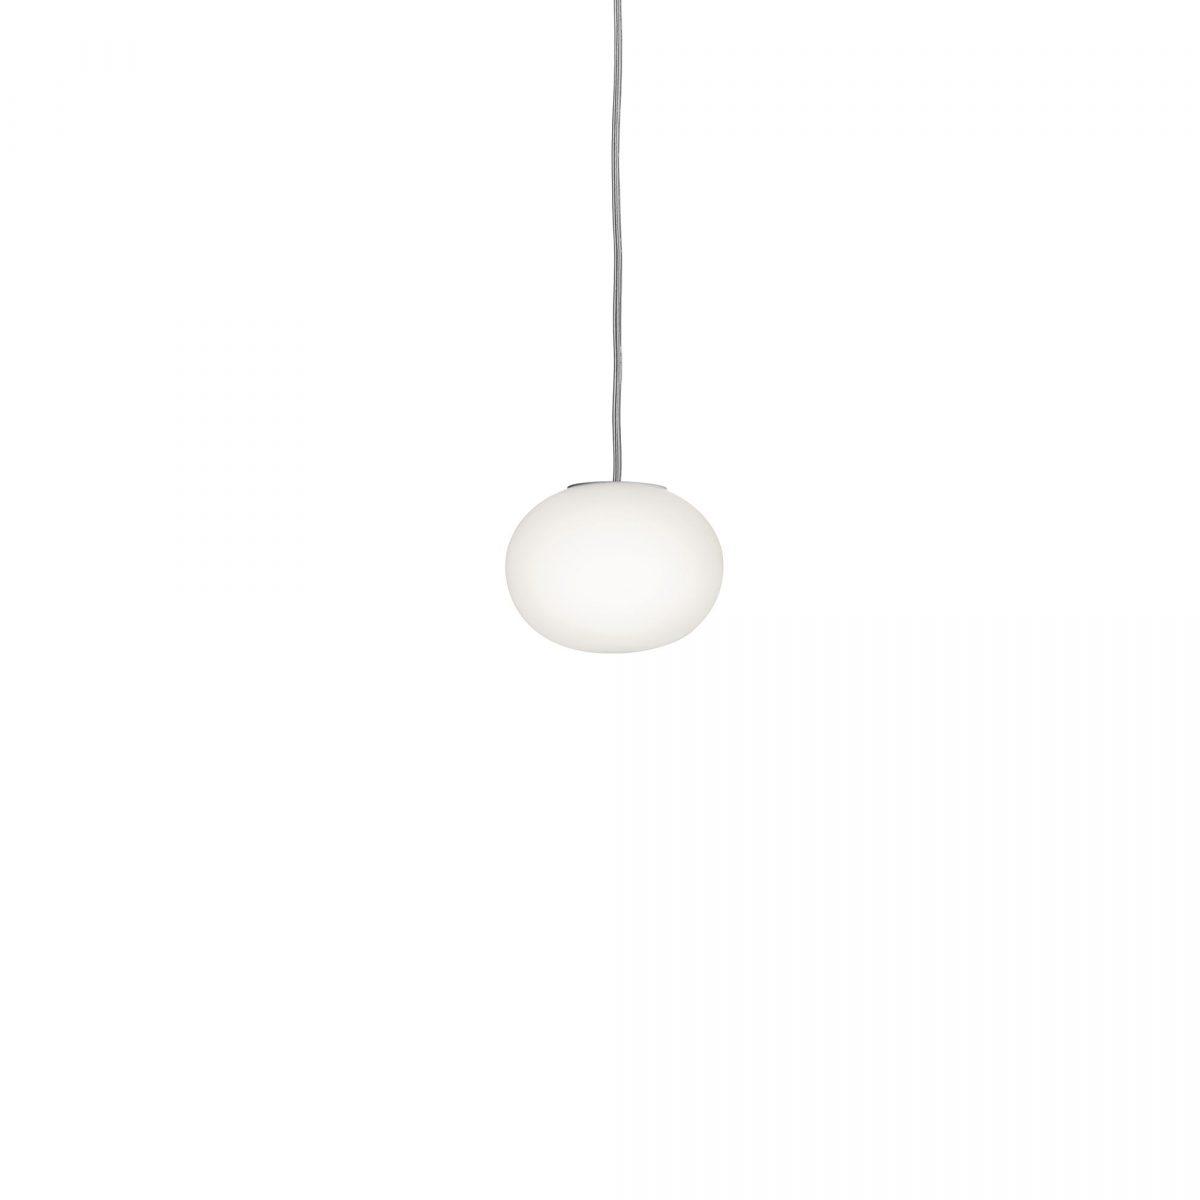 glo-ball-suspension-mini-morrison-flos-F4195009-product-still-life-big